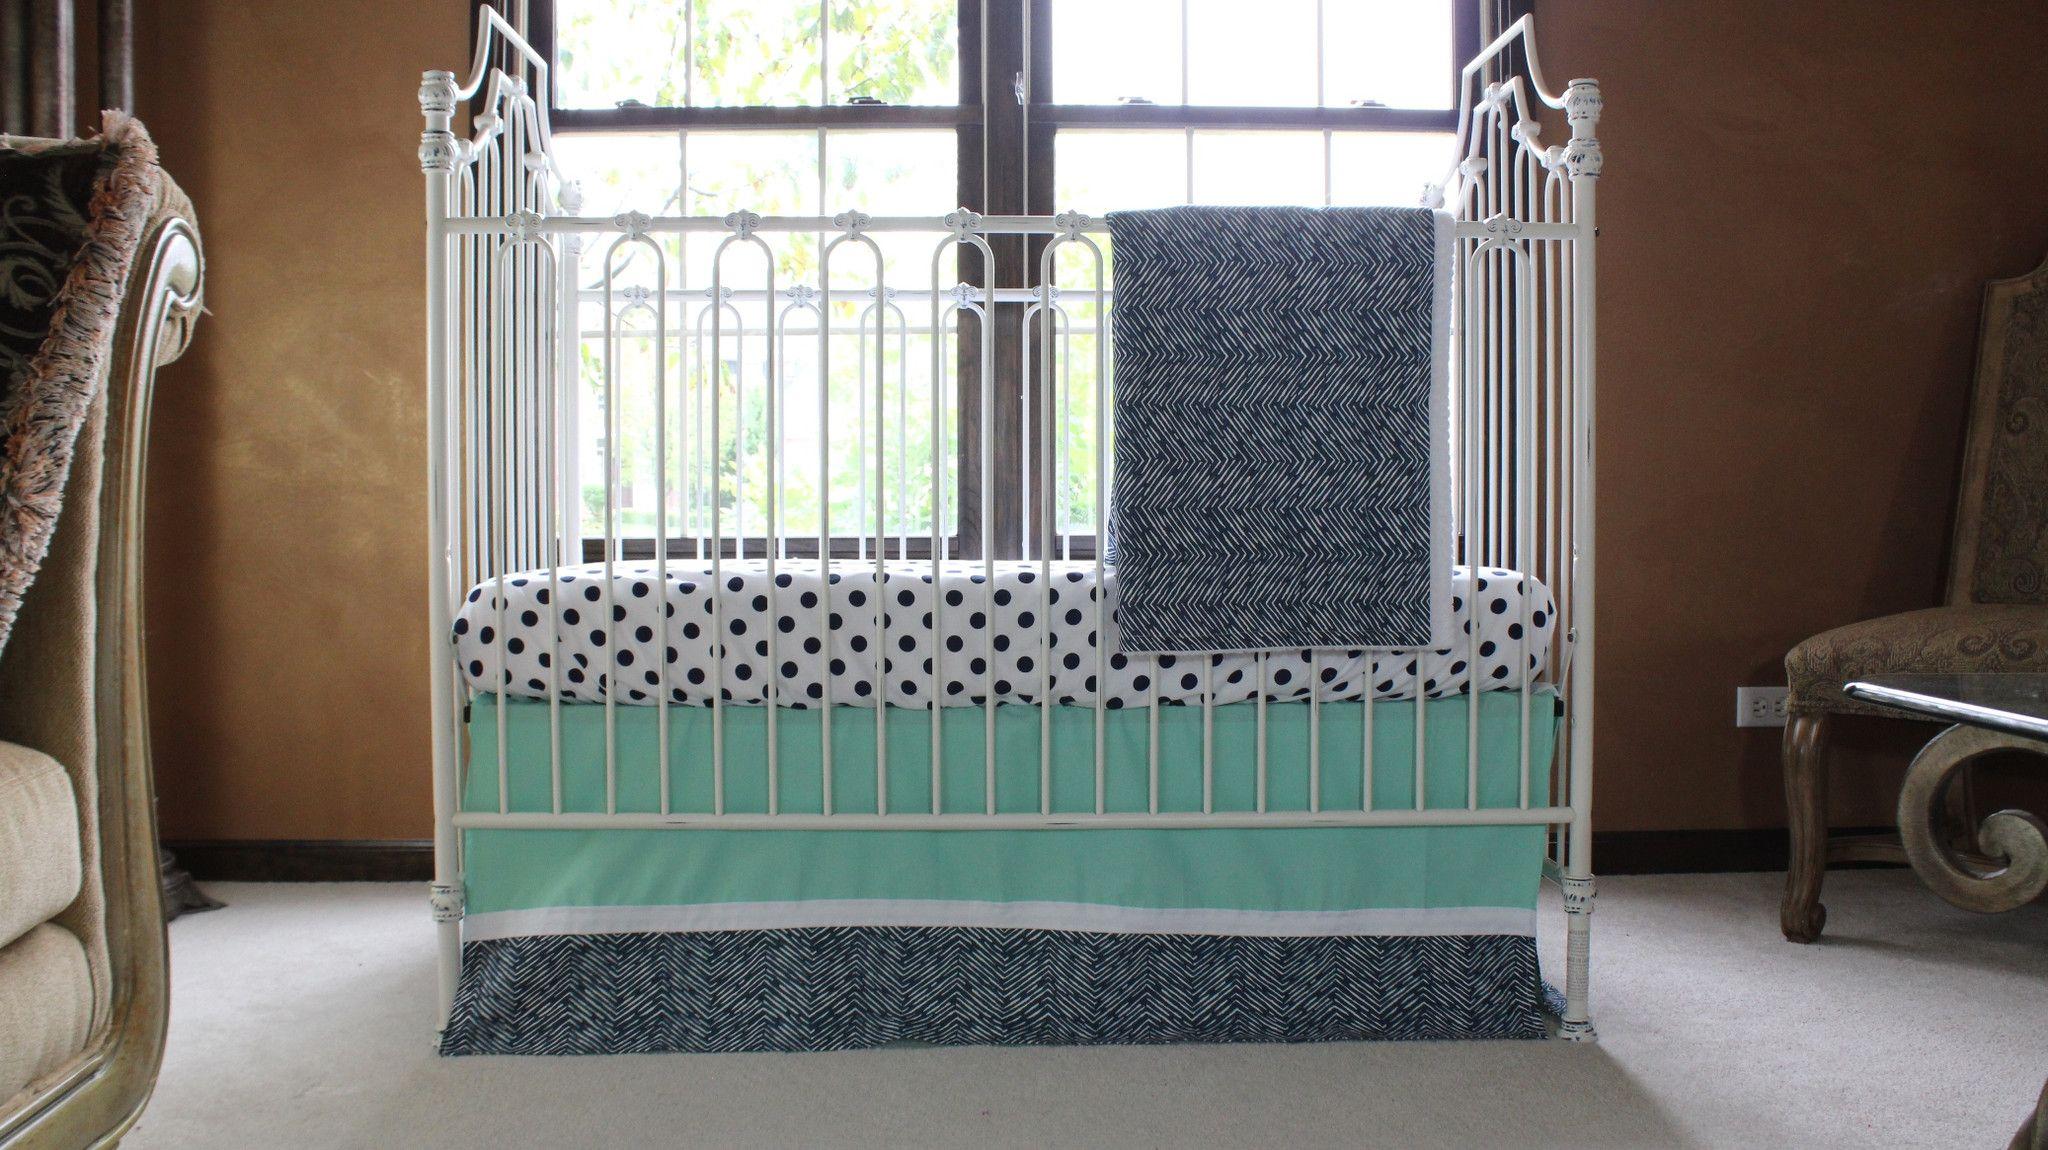 Alexander S Mint And Navy Chevron Crib Bedding Daybed Bedding Chevron Crib Bedding Baby Crib Bedding Chevron Baby Bedding